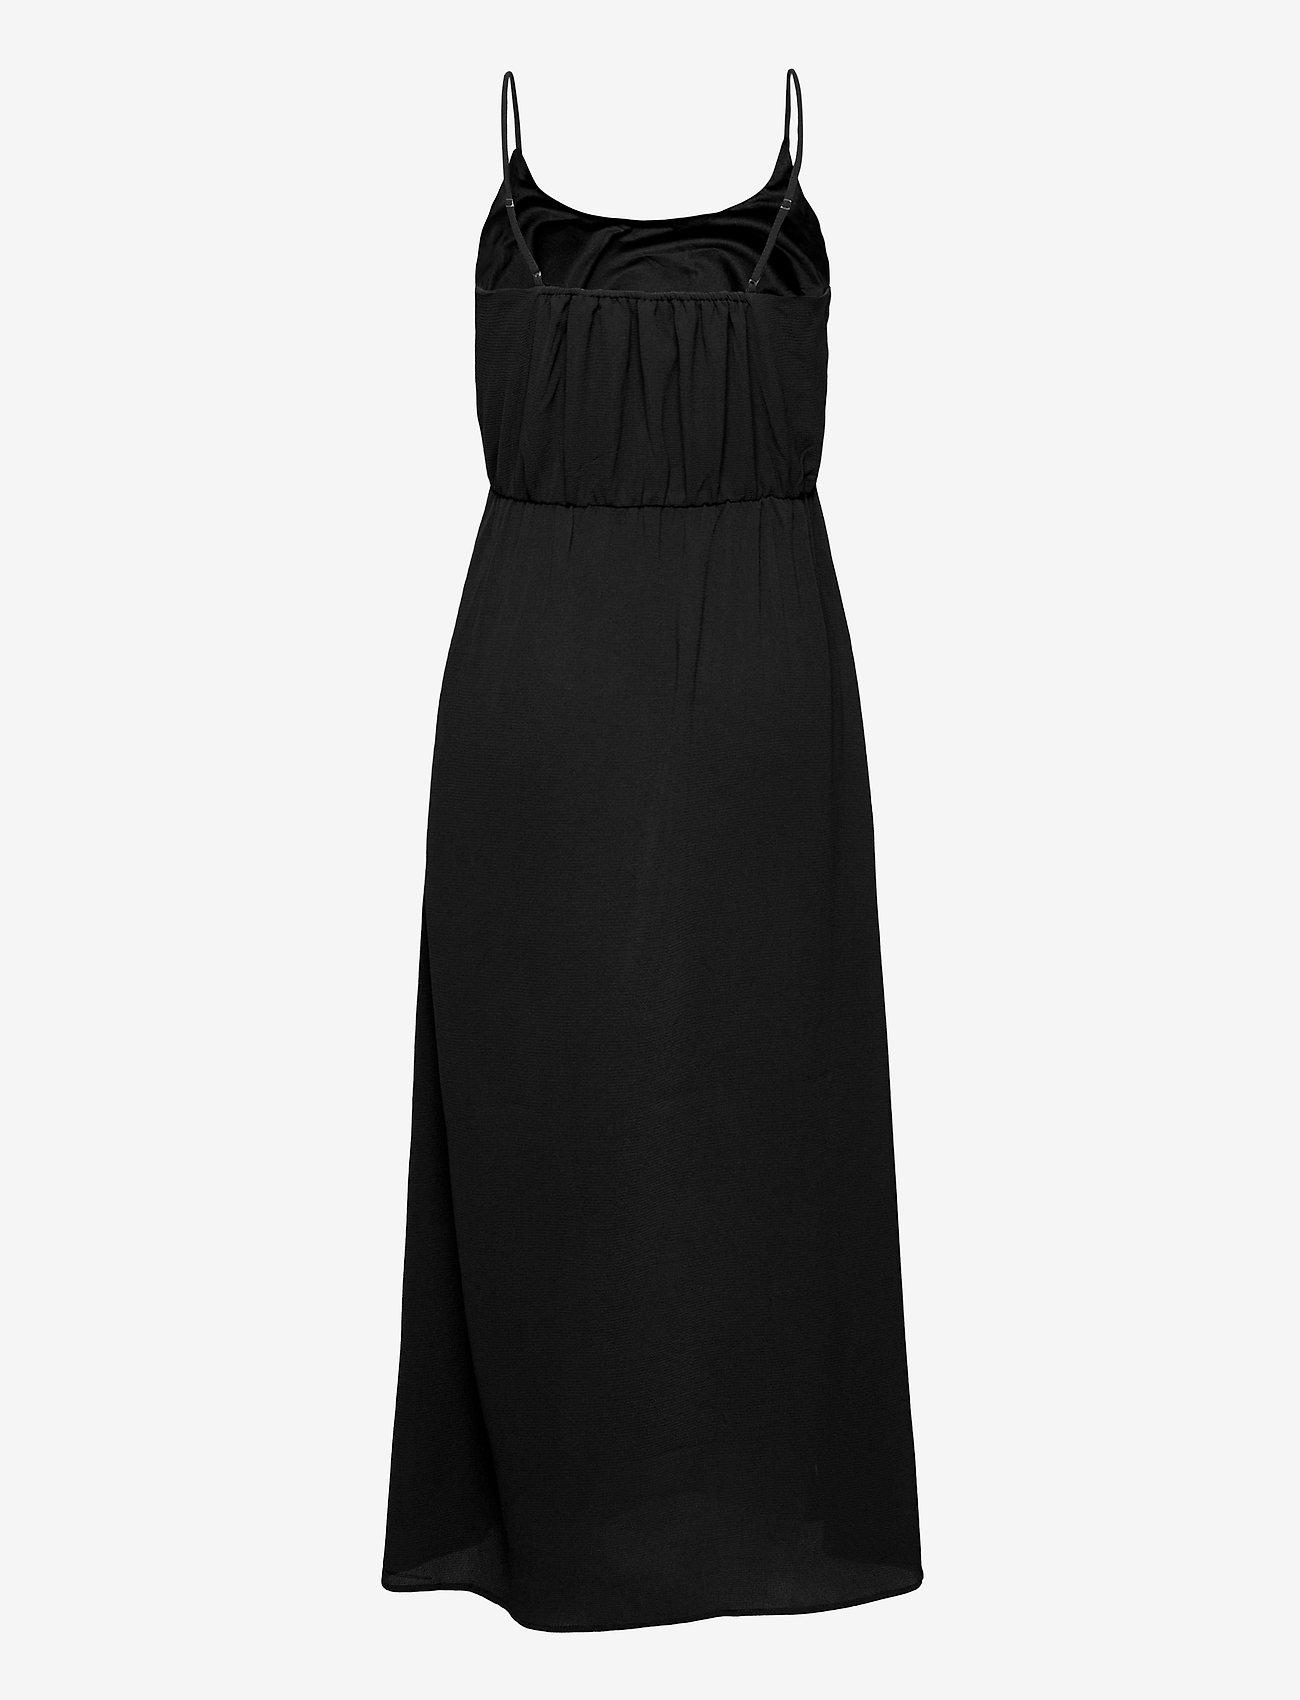 Vero Moda - VMSASHA MAXI DRESS GA - sommarklänningar - black - 1